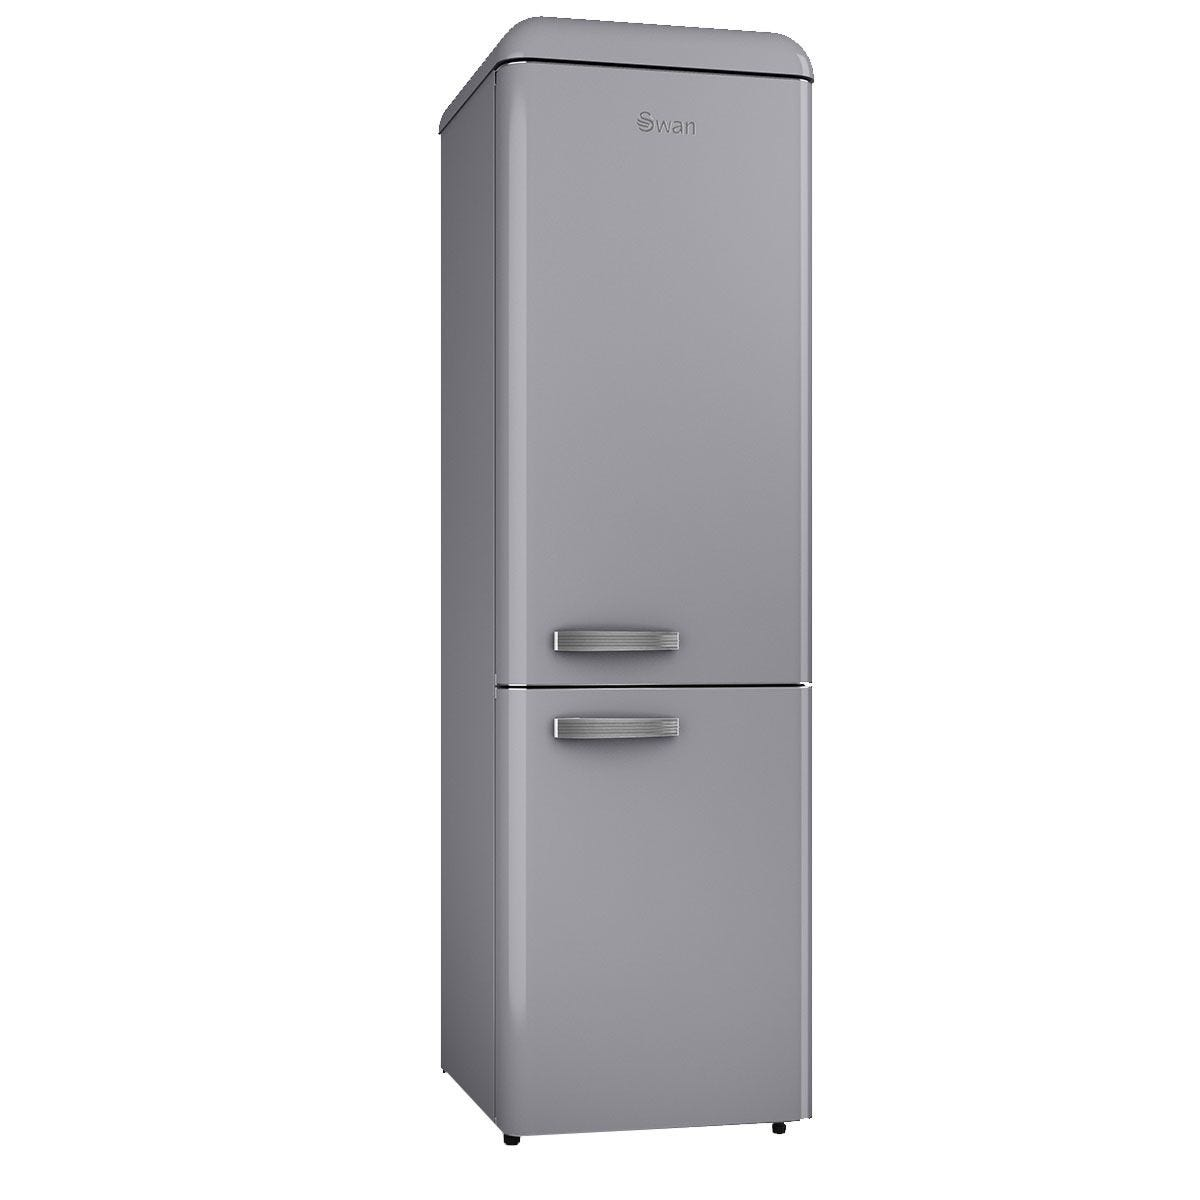 Swan SR11025GRN Retro Slimline Fridge Freezer - Grey